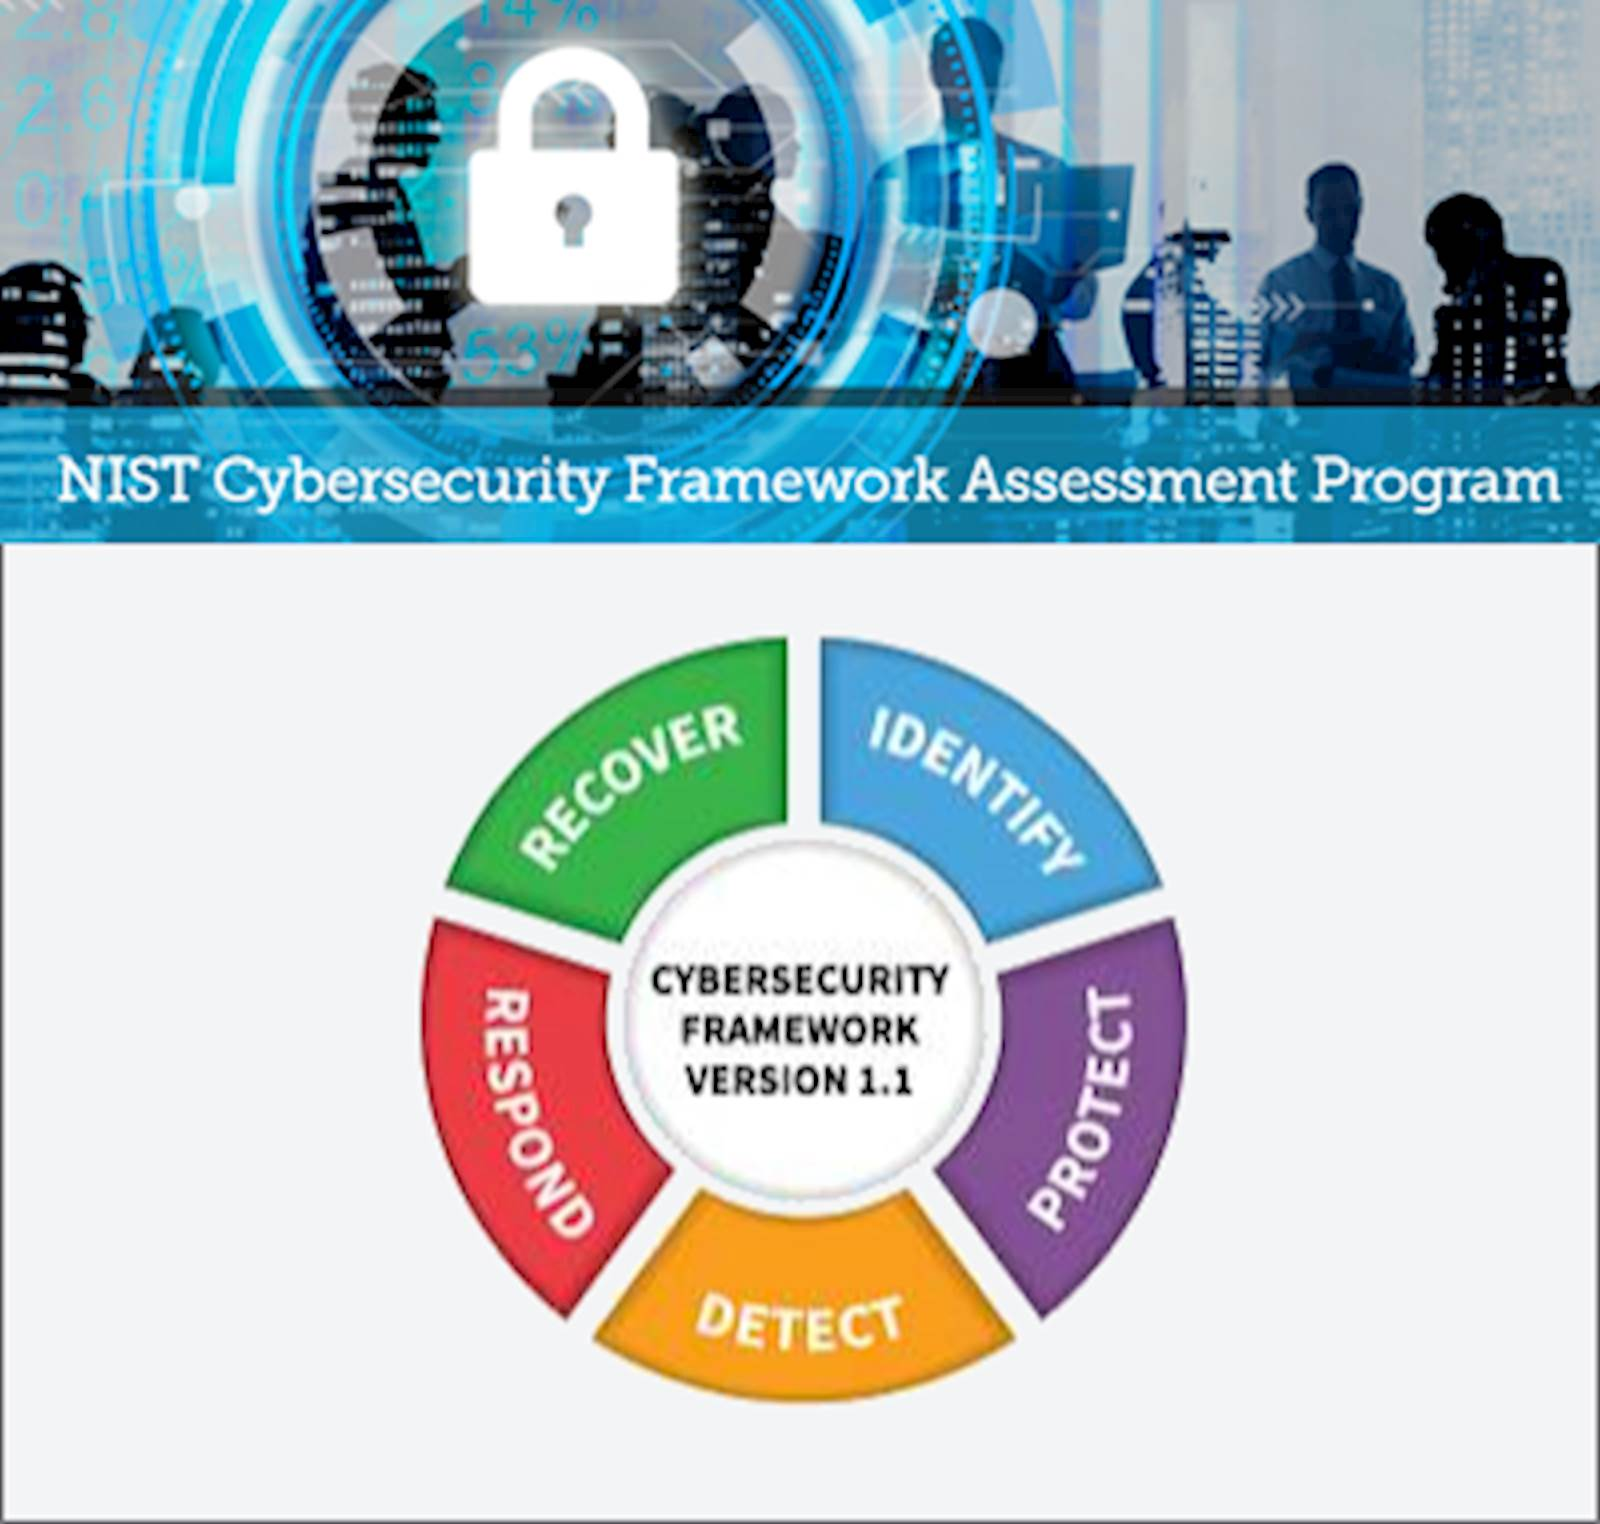 NIST Cybersecurity Framework Training